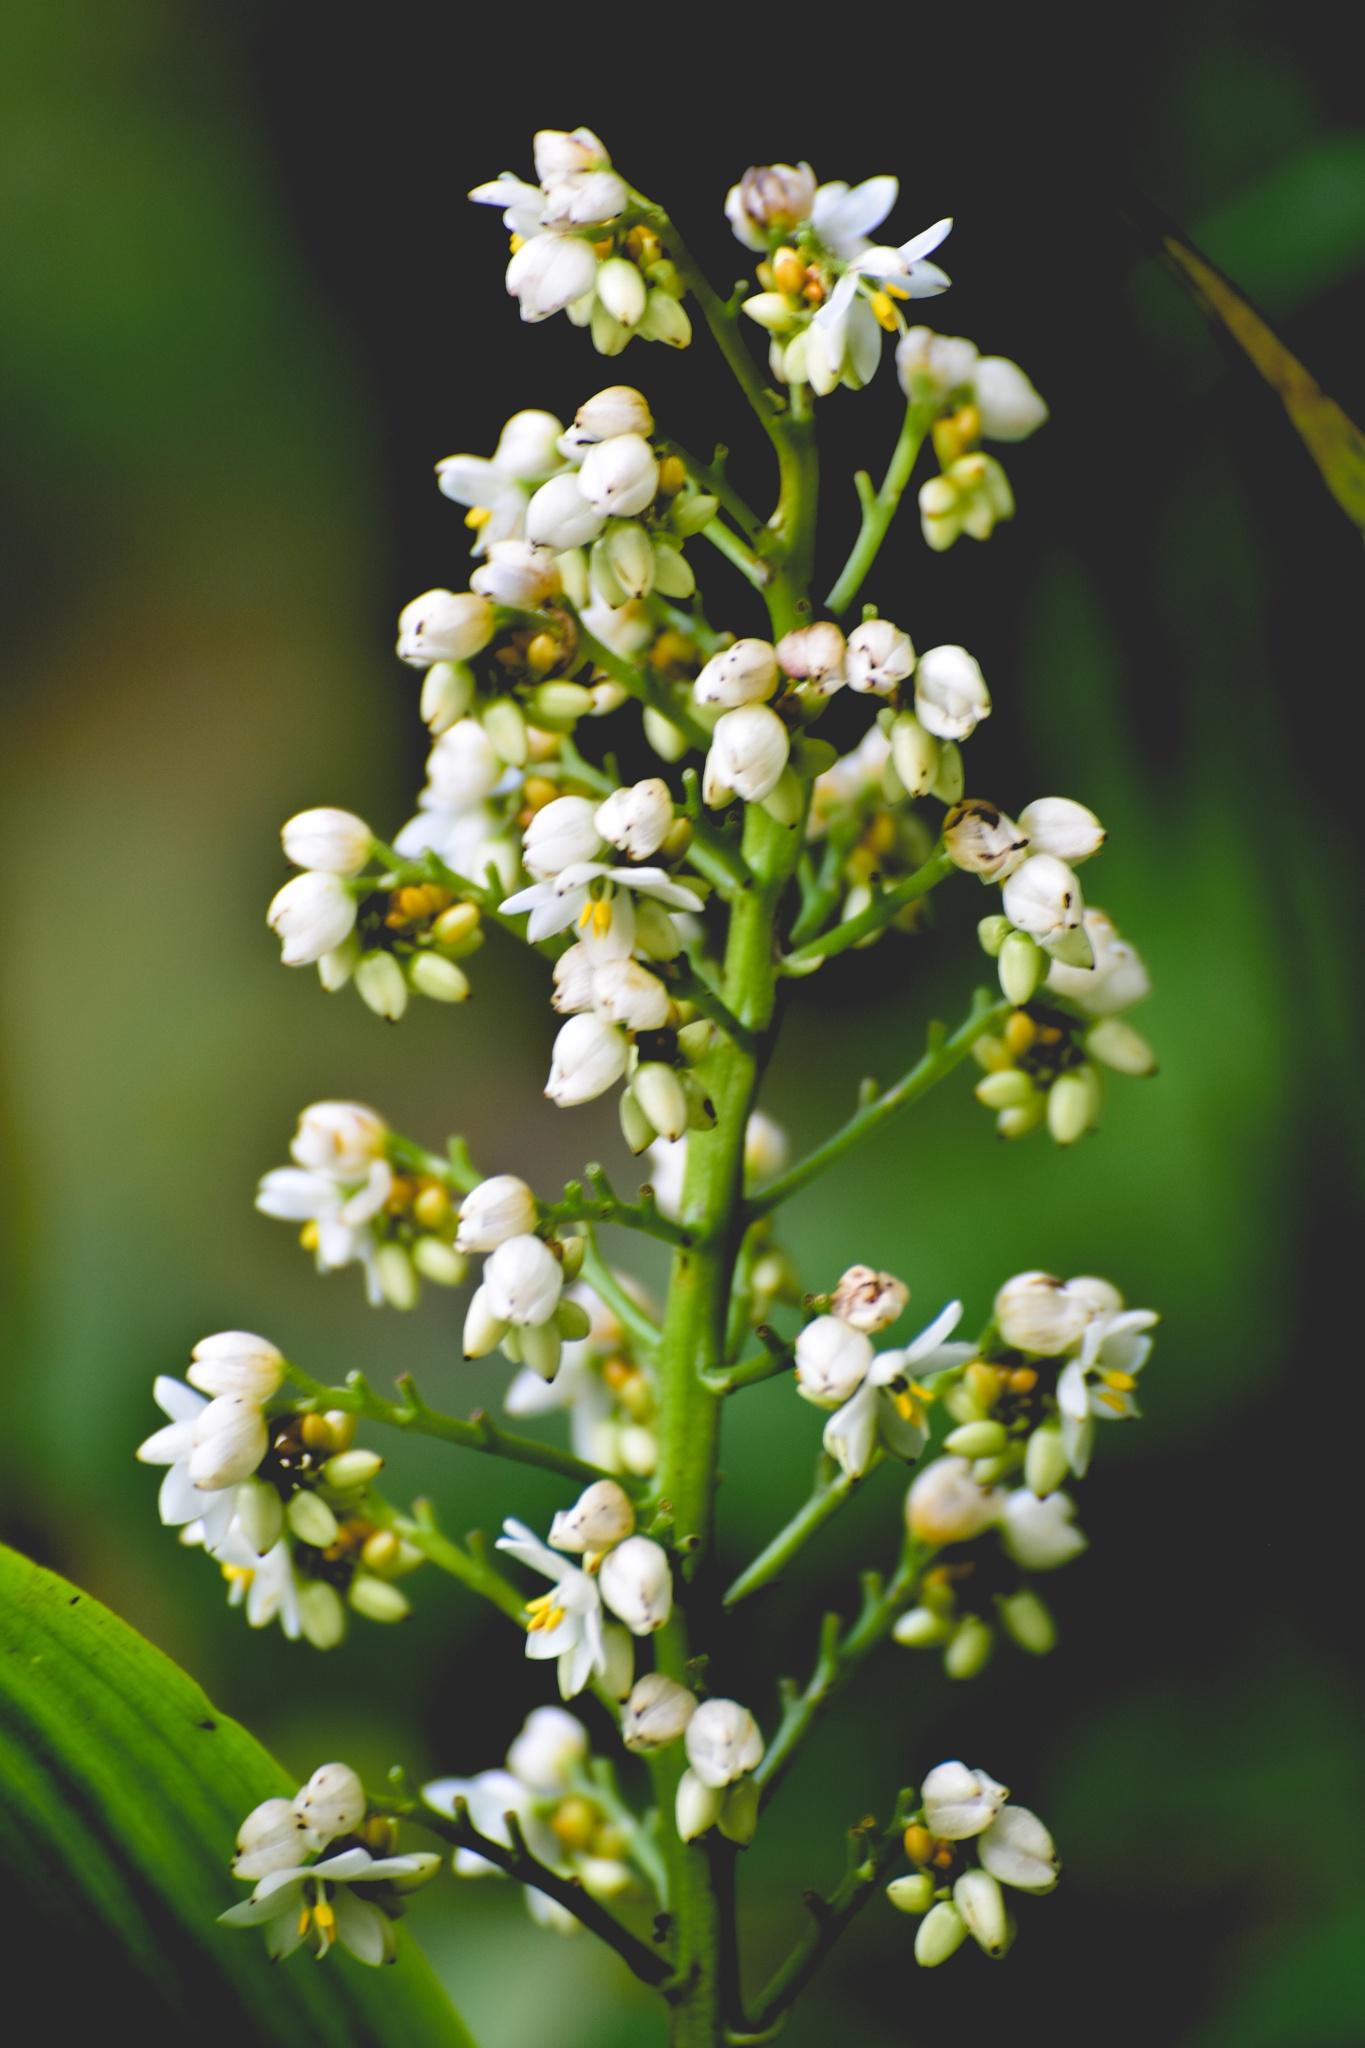 Flowers by nalaka526